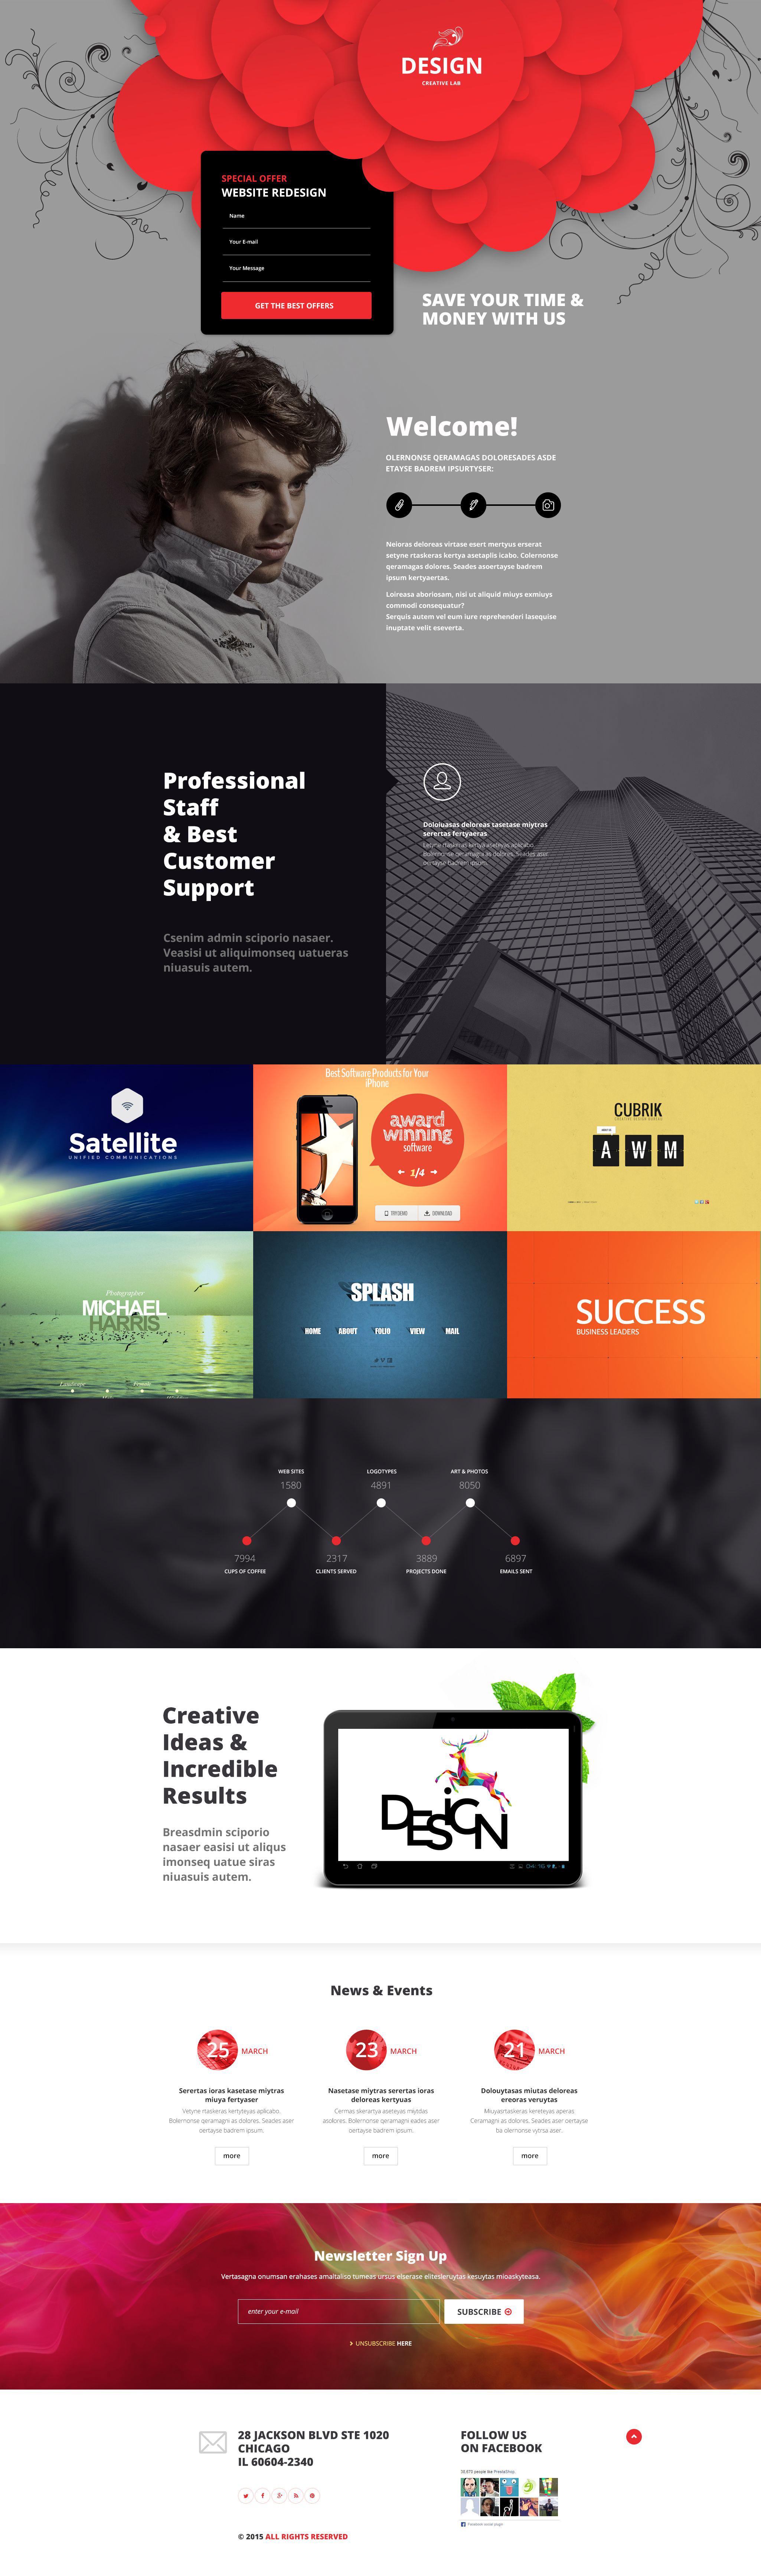 Design Studio Responsive Landing Page Template - screenshot